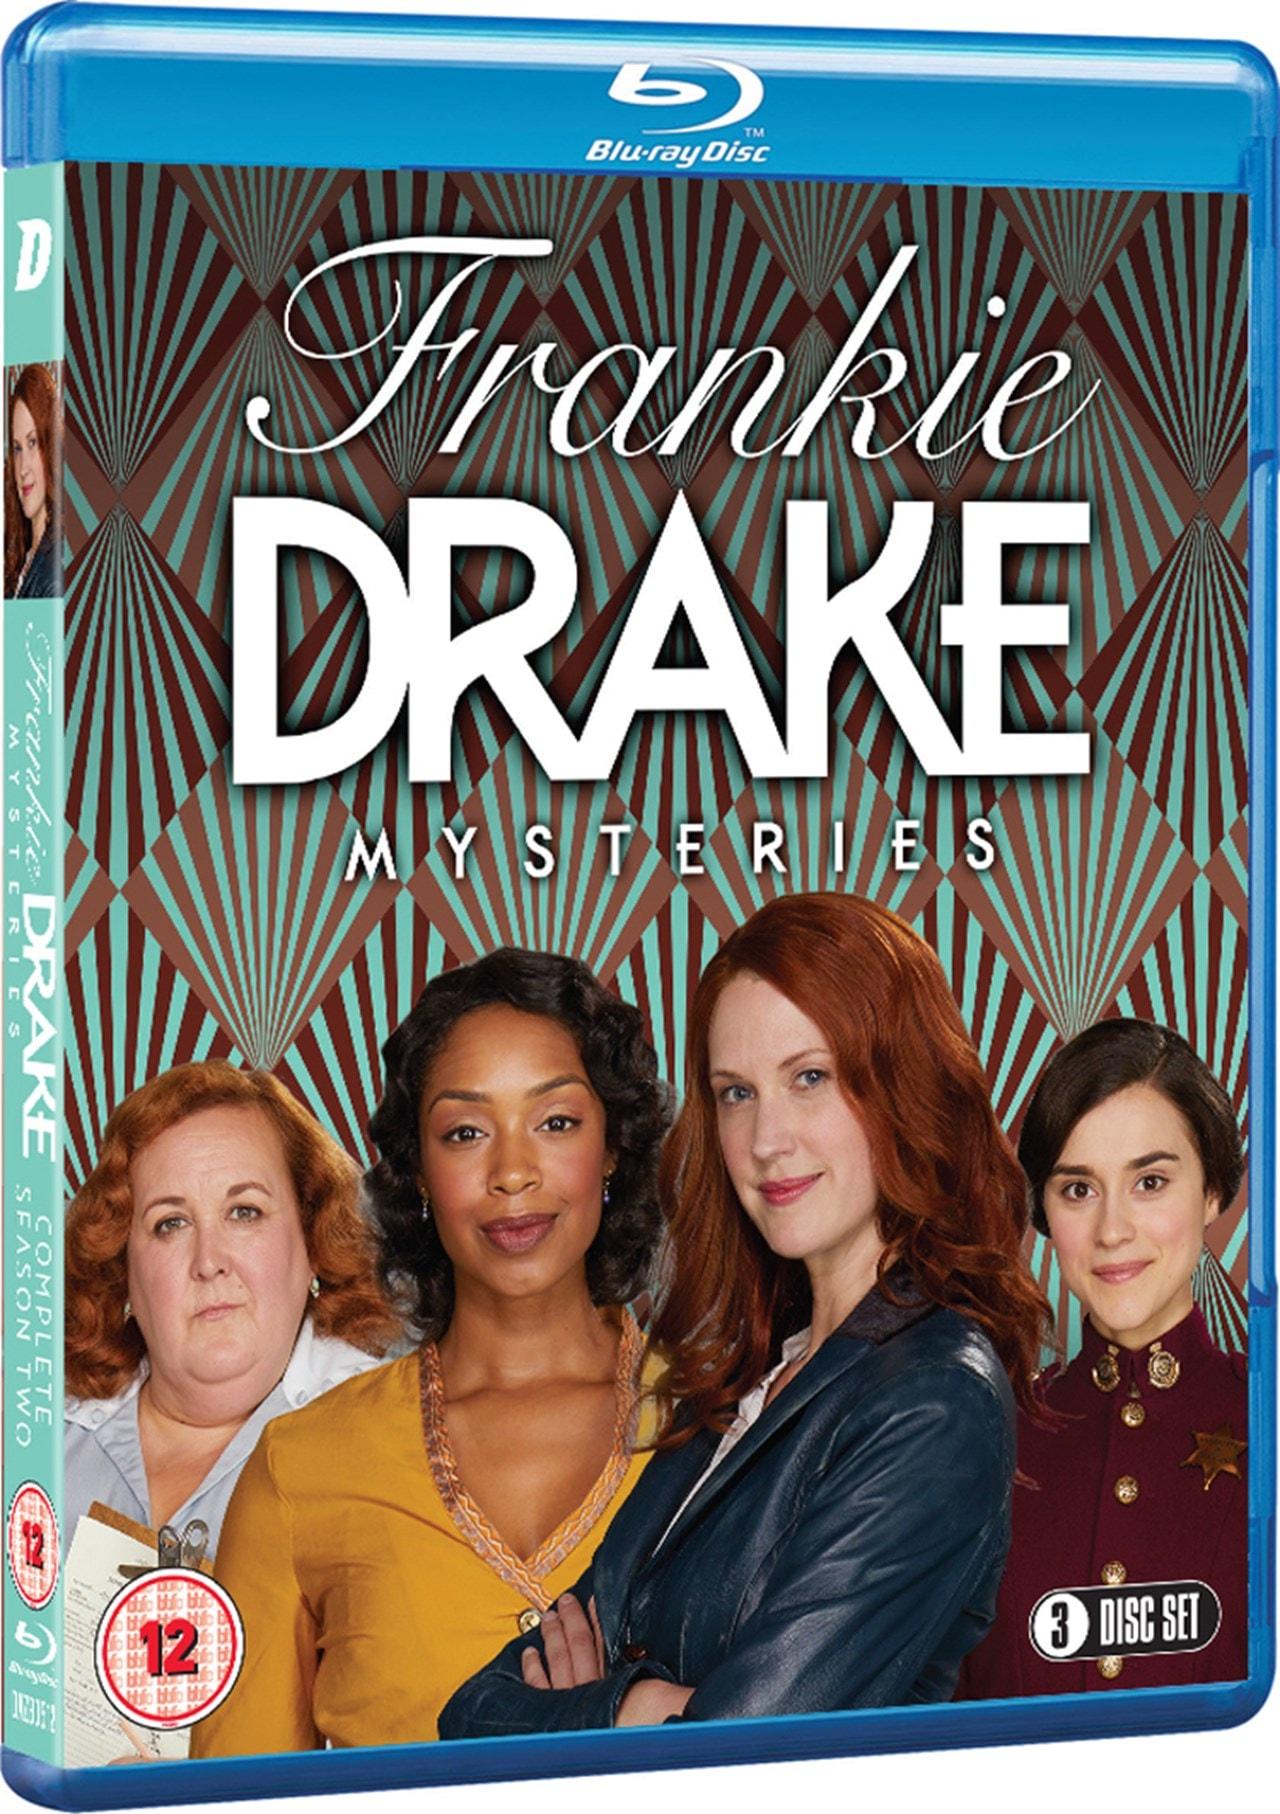 Frankie Drake Mysteries: Complete Season Two - 2